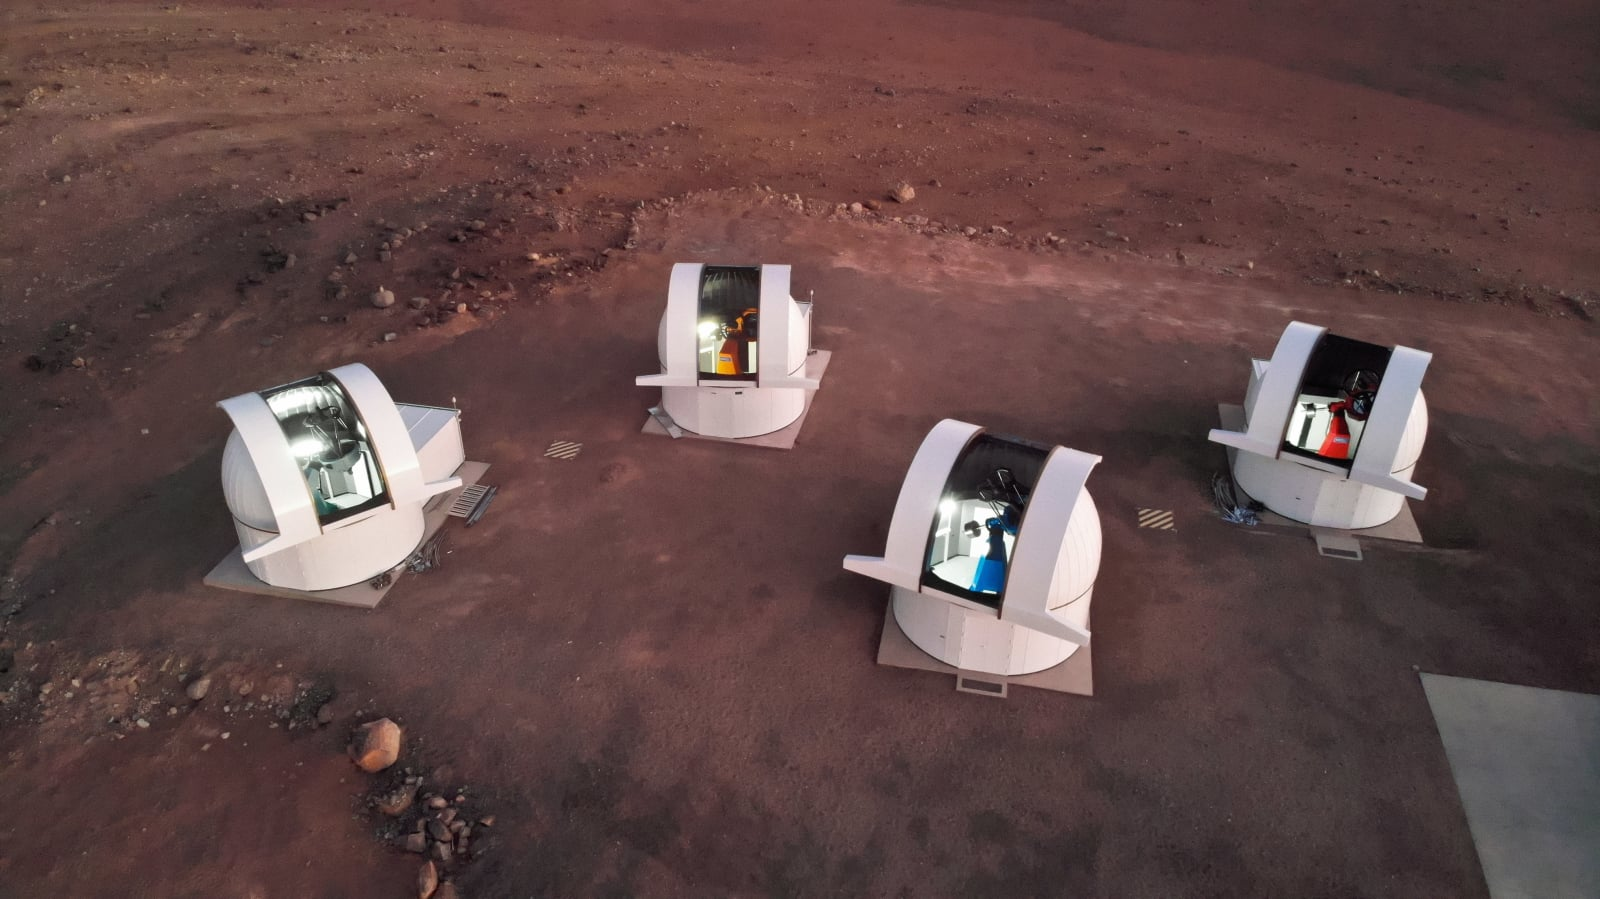 Obserwatorium astronomiczne w Chile. Fot. PAP/EPA/TAU TEC GMBH